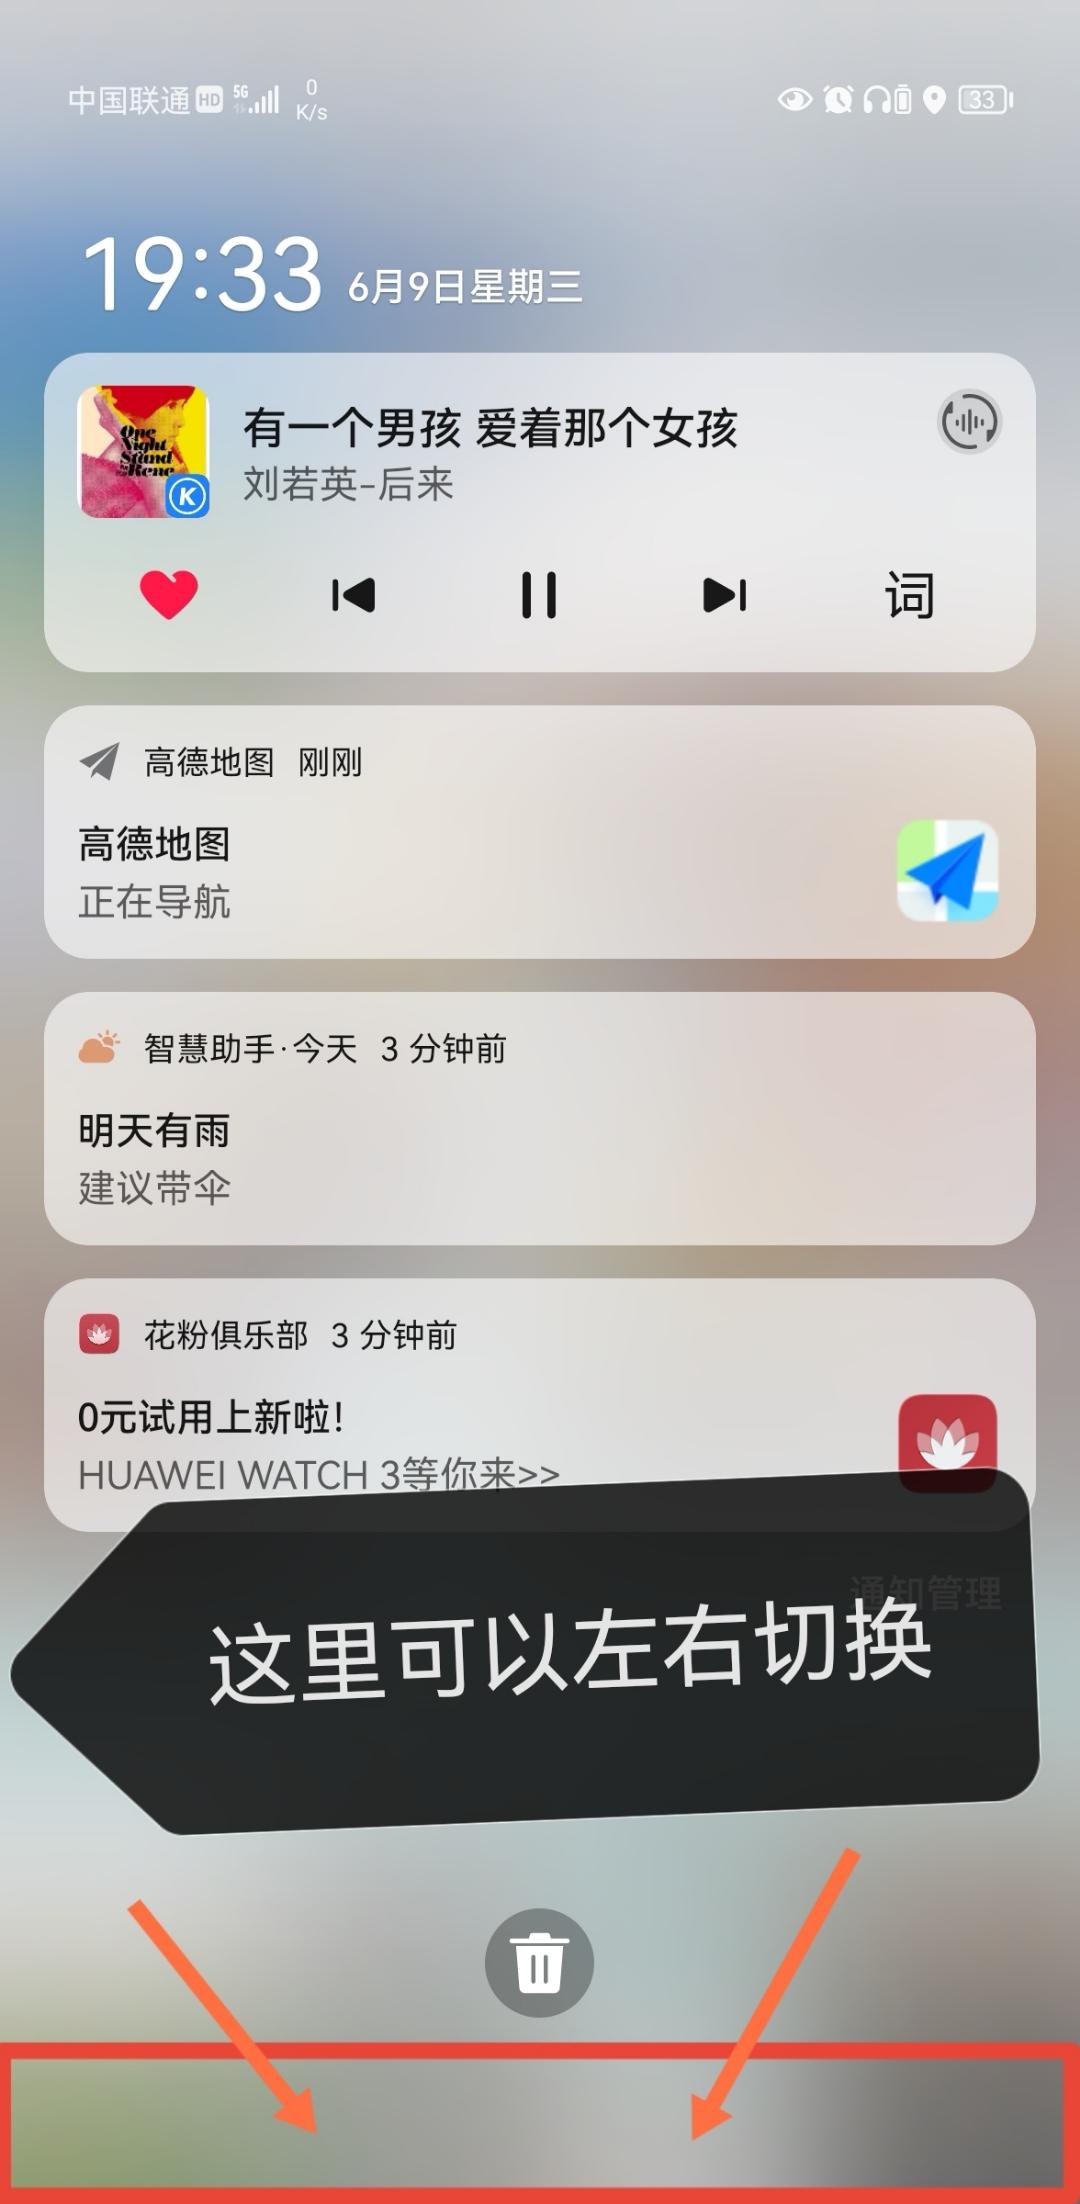 Screenshot_20210609_193303_com.android.gallery3d_edit_31867811952949.jpg